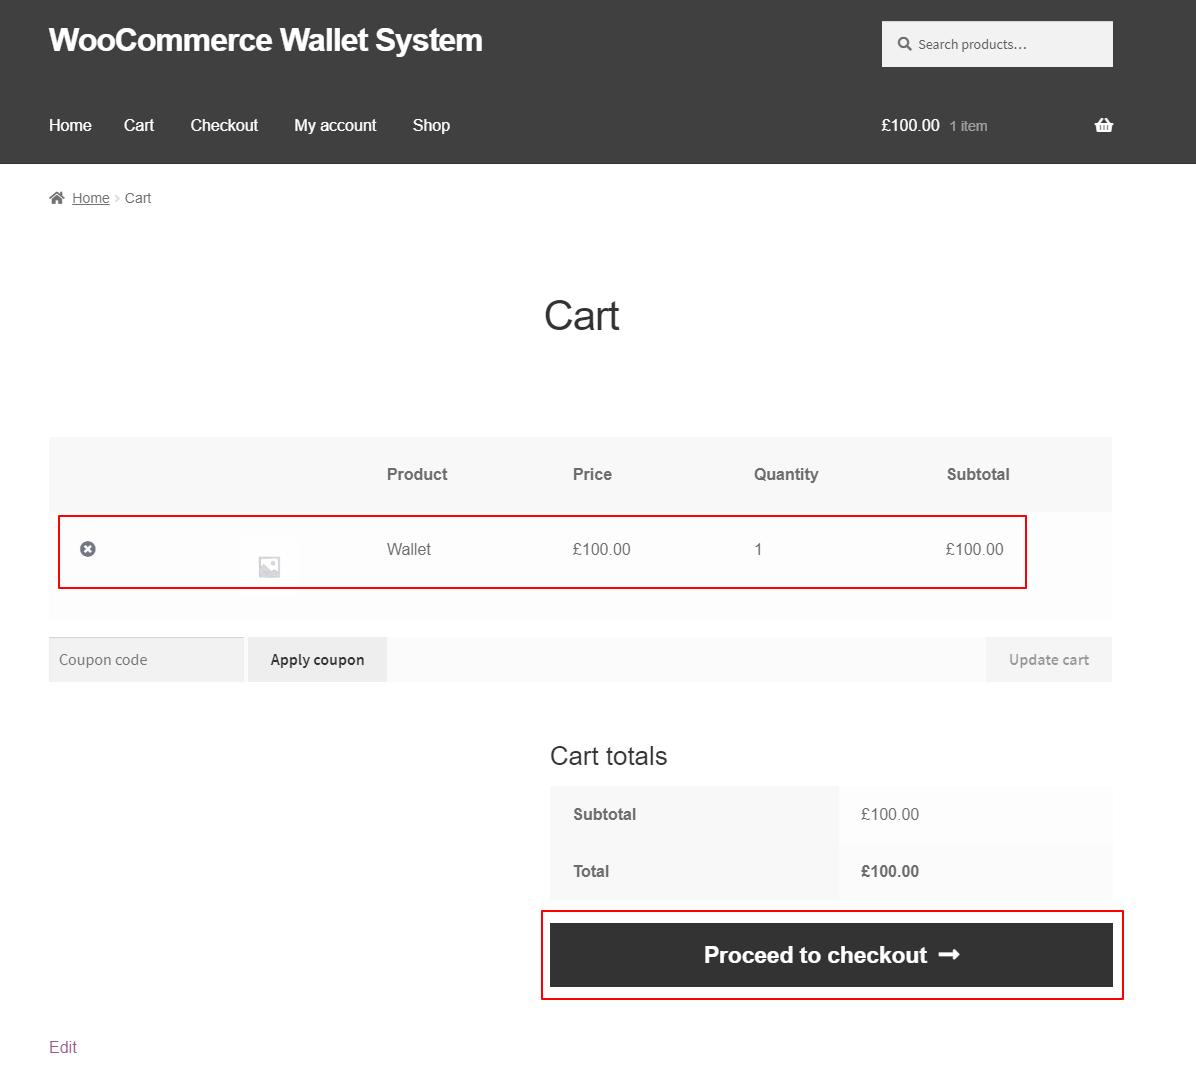 webkul-woocommerce-wallet-system-customer-cart-page